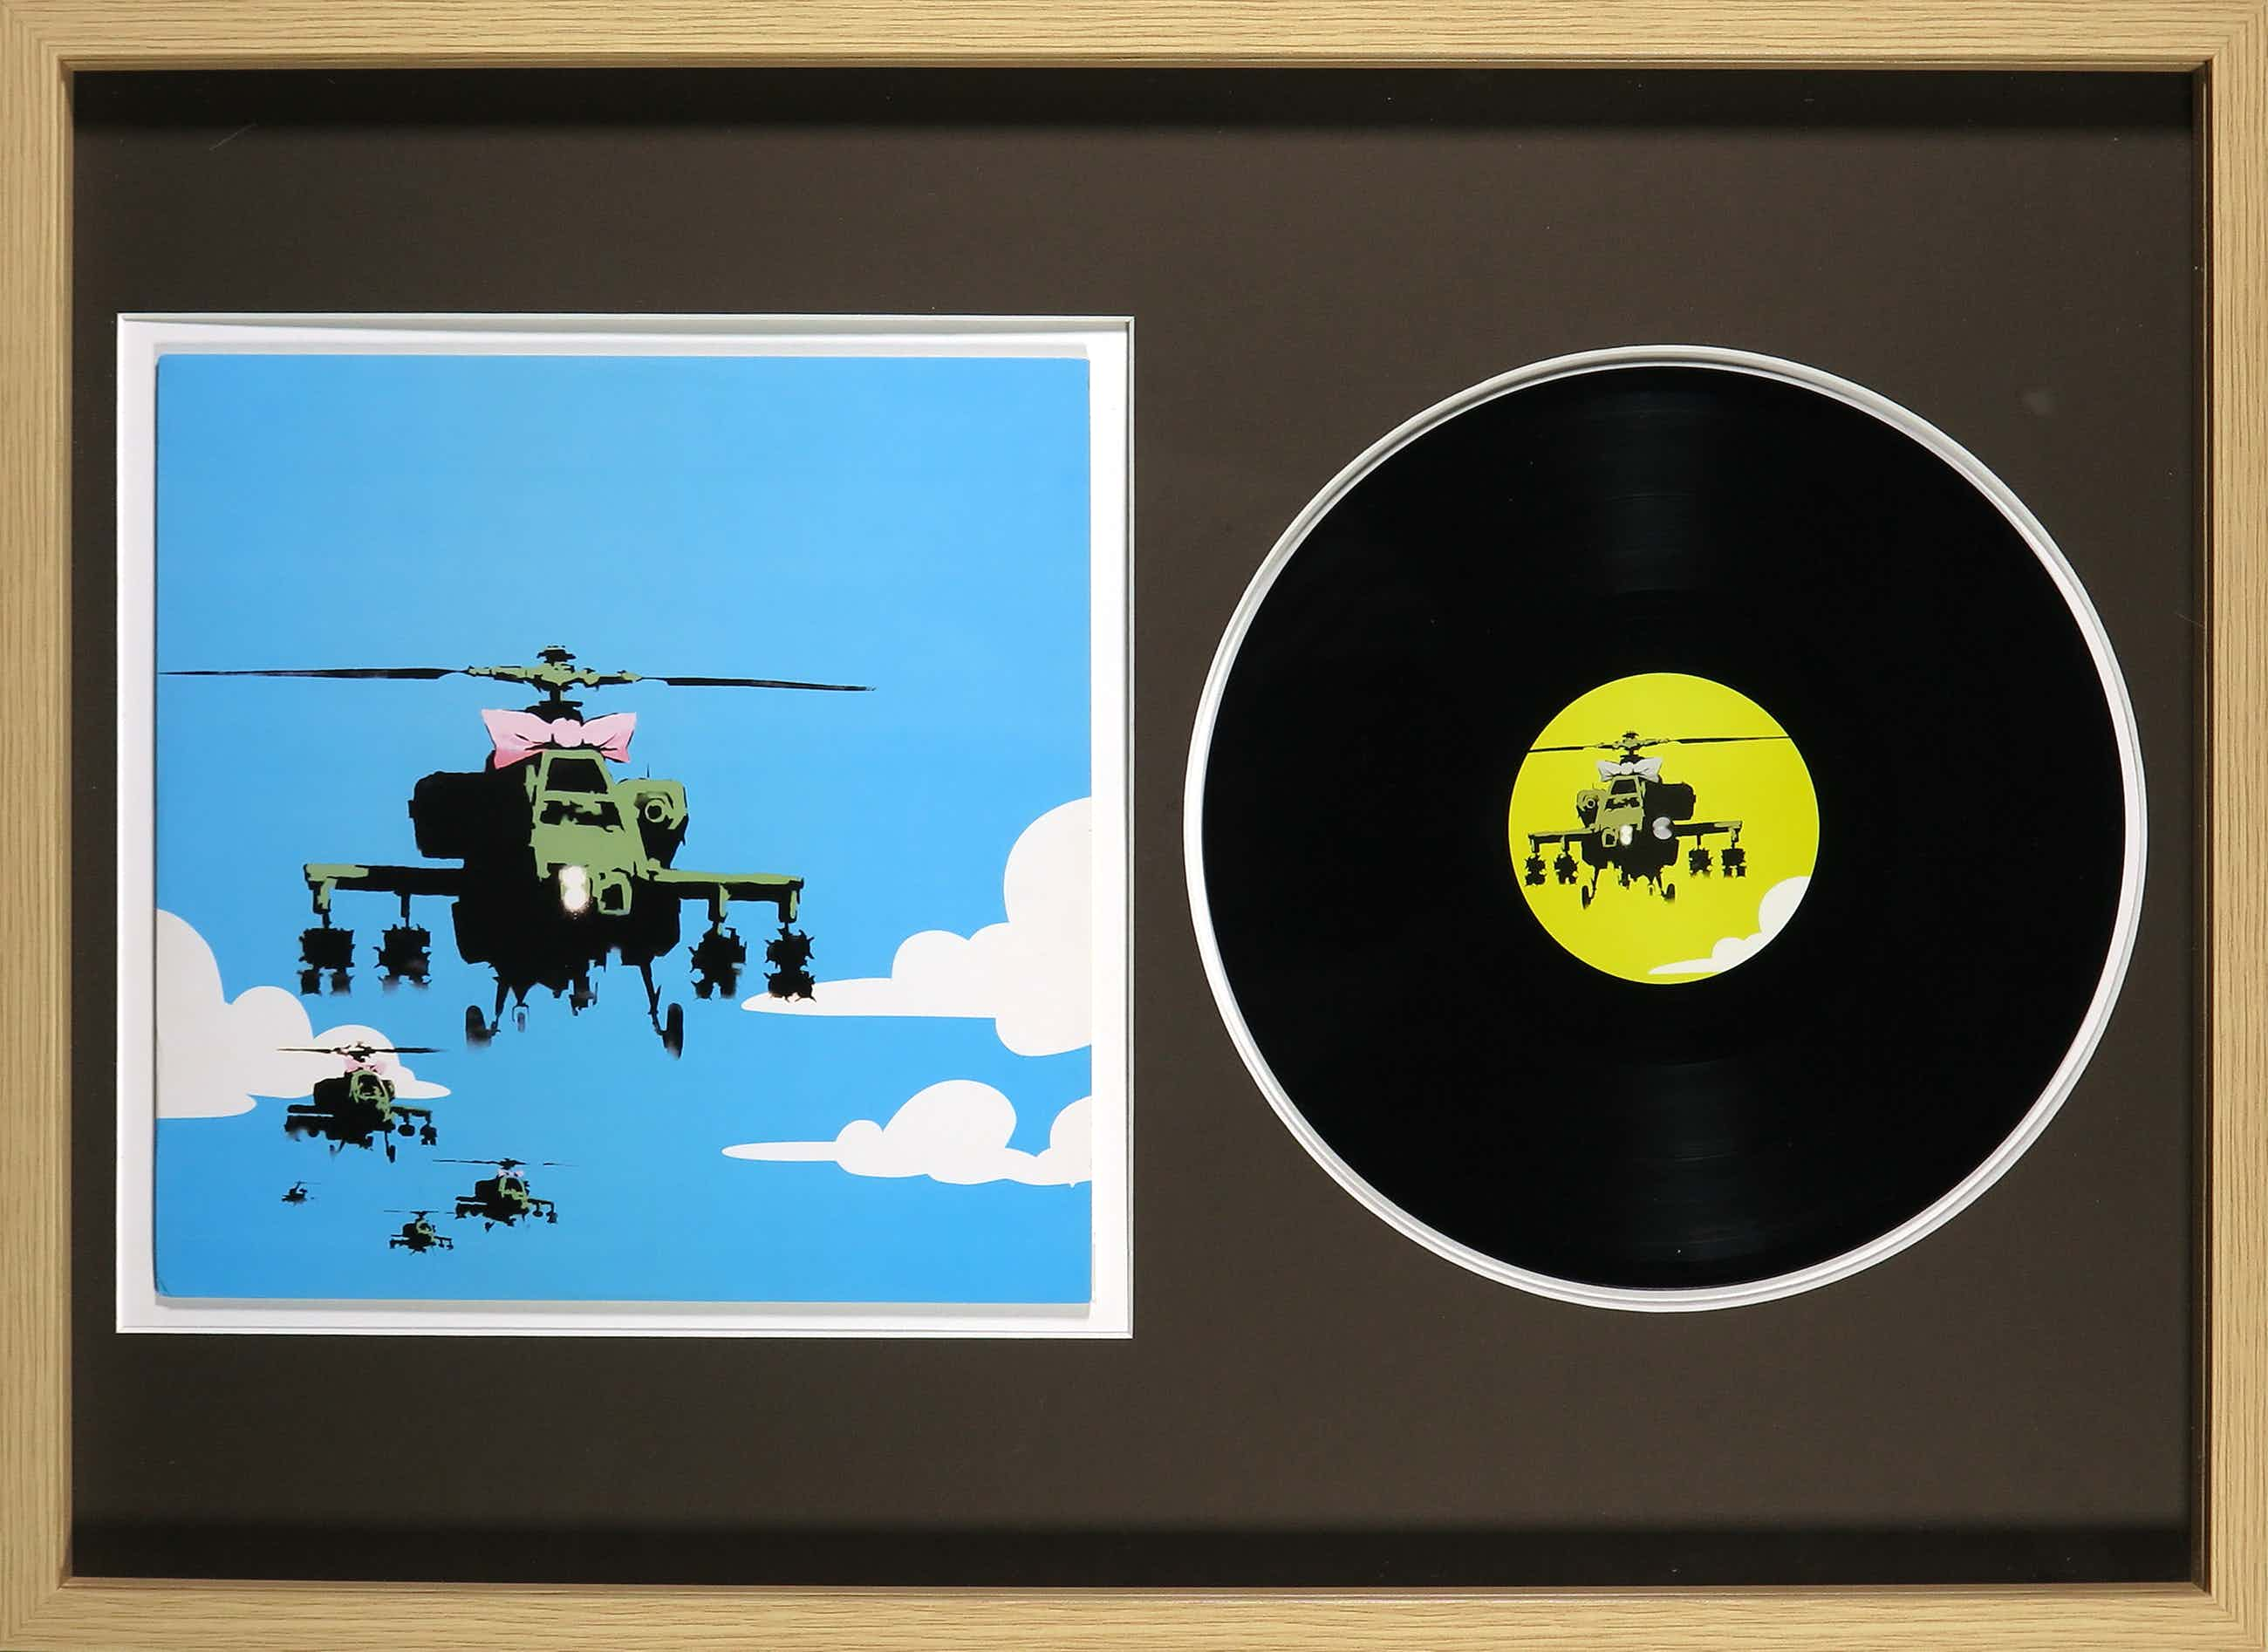 Banksy - Dirty Funker - Flat Beat - Ingelijst kopen? Bied vanaf 1100!